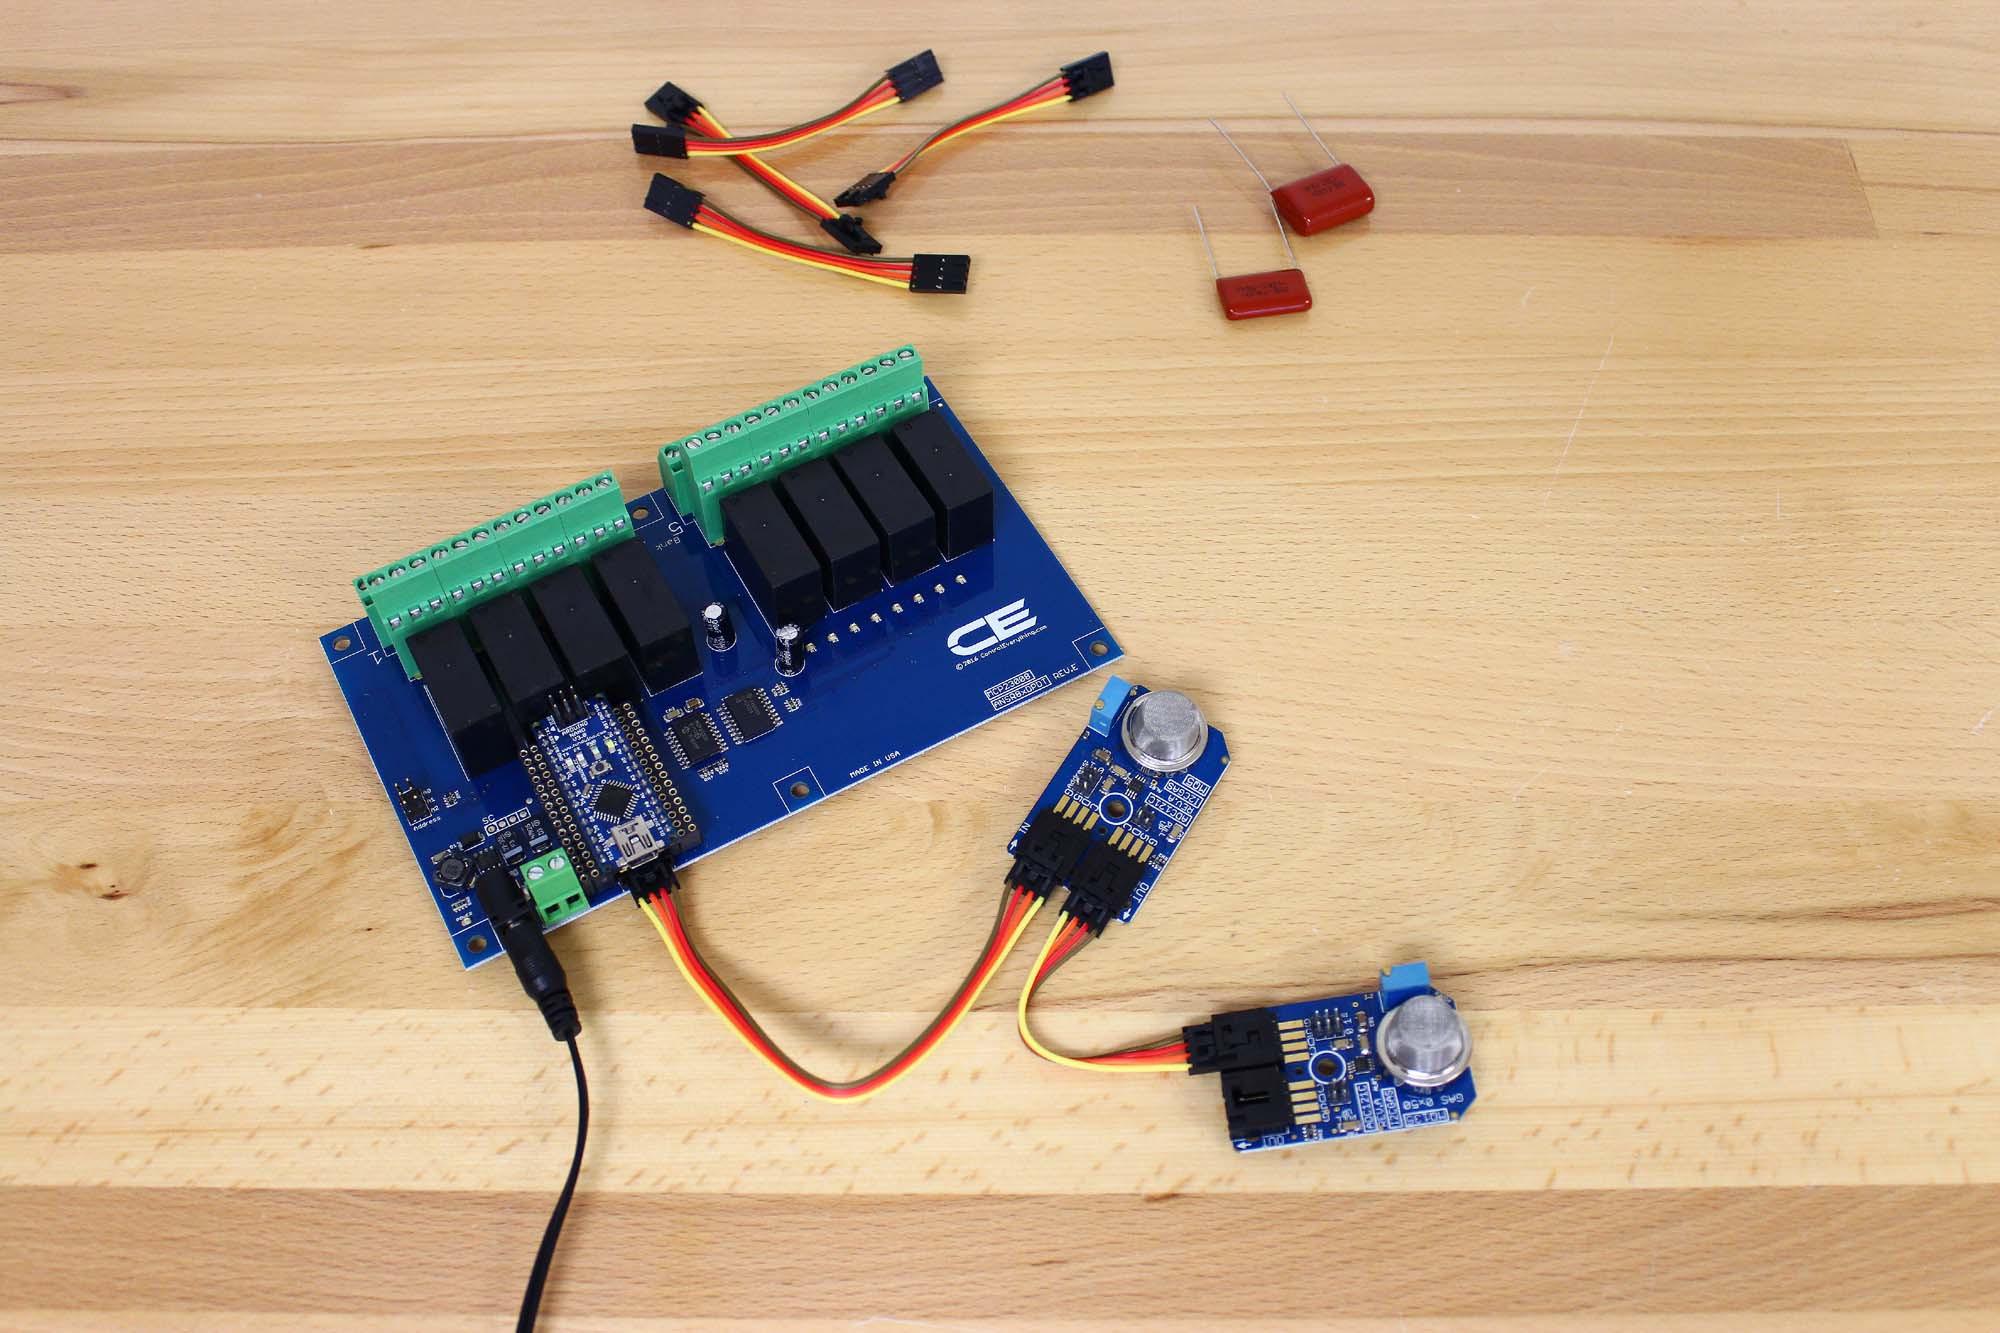 Iot Mq131 Ozone Gas Sensor Module For Arduinoraspberry Pi Wiring Board Arduino Controlled Relay